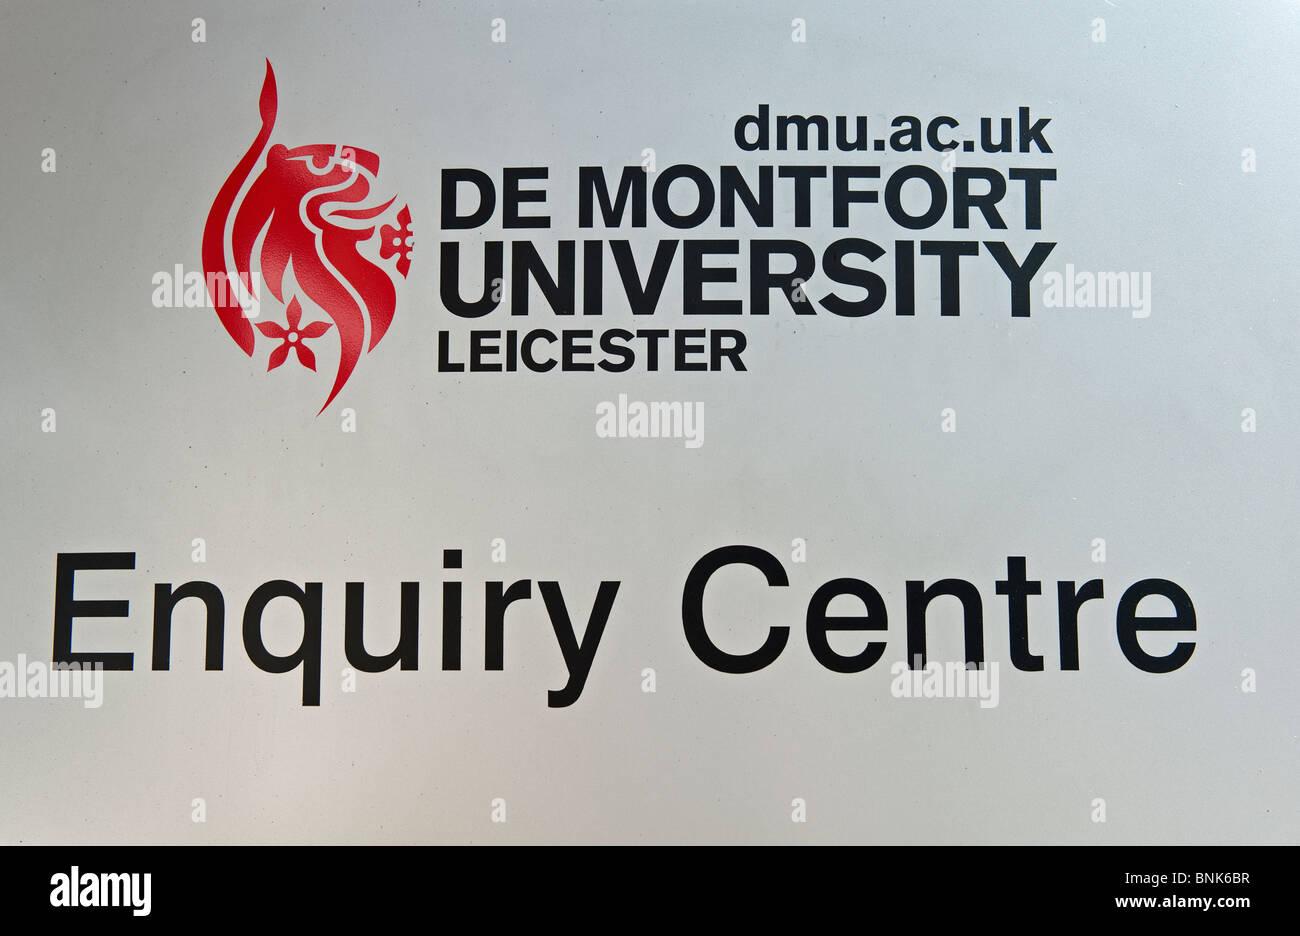 Sign for De Montfort University Enquiry Centre in Leicester city. - Stock Image